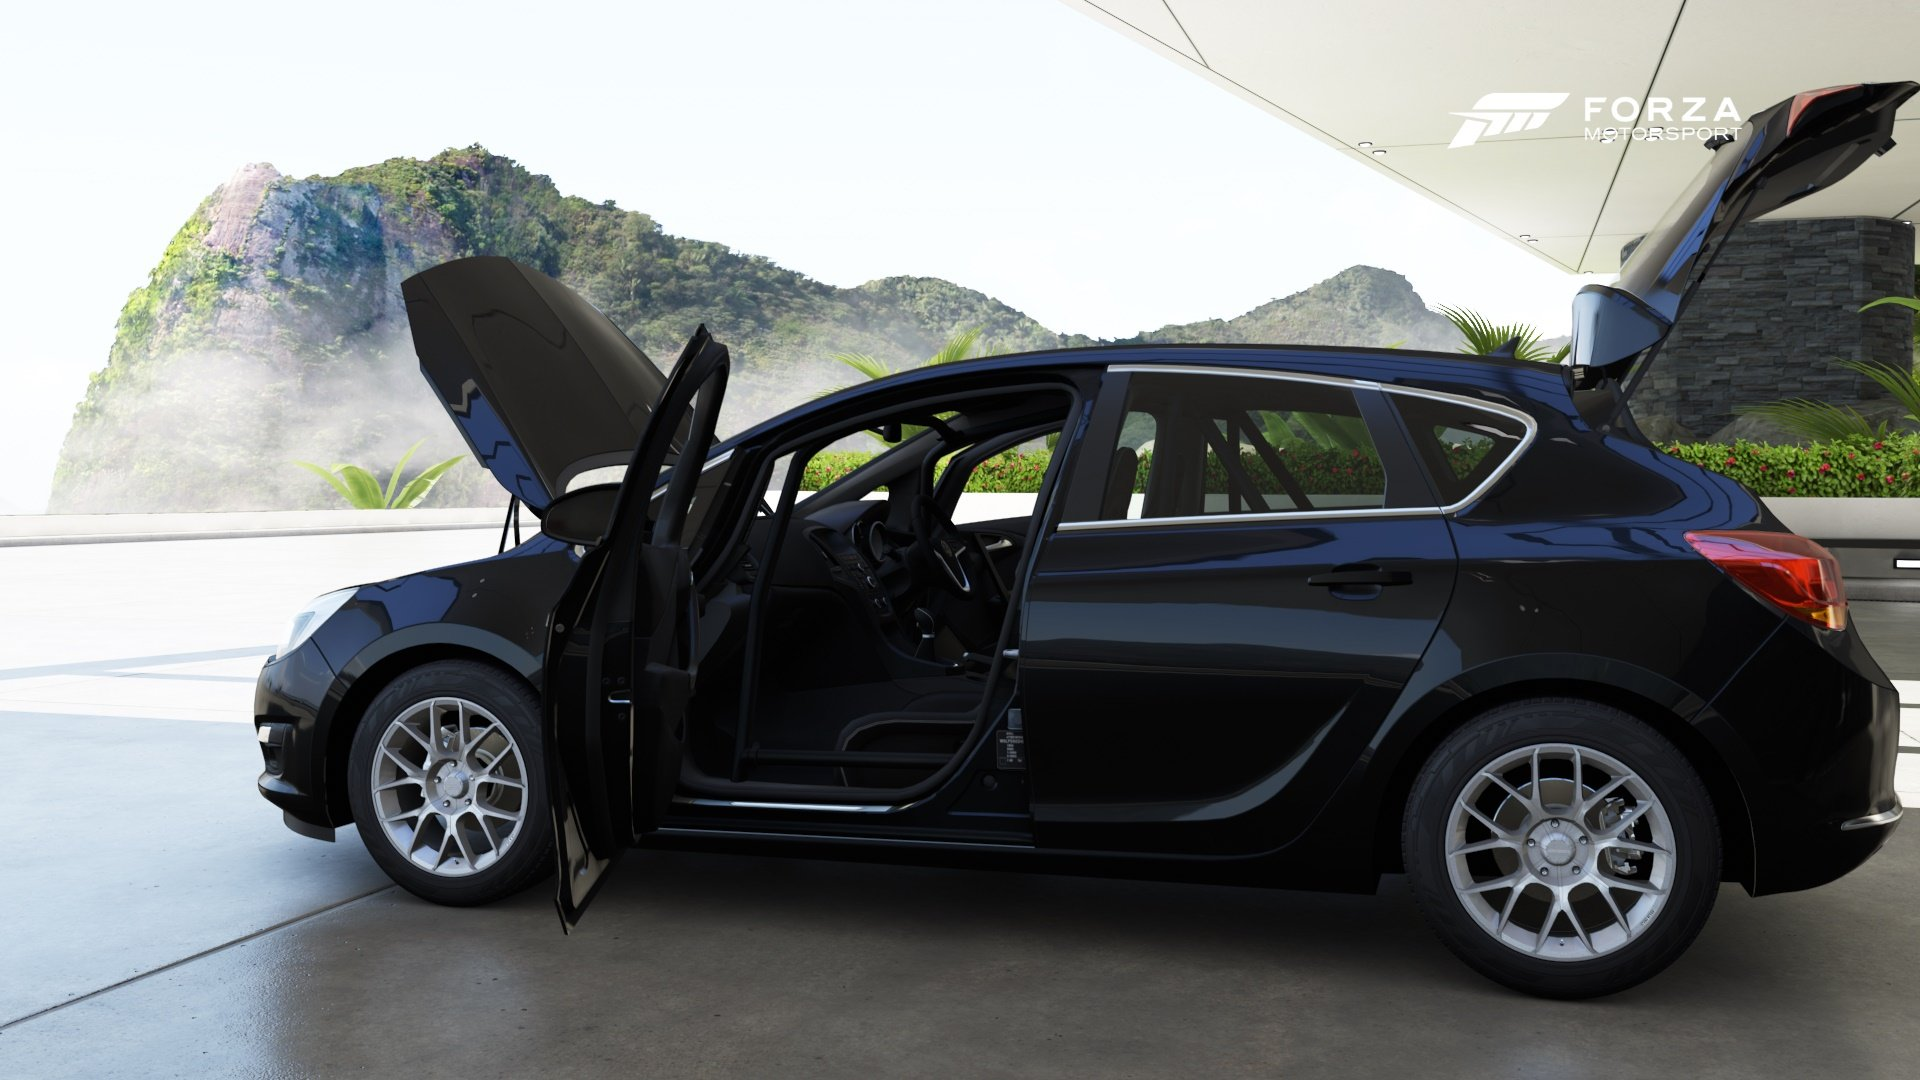 Глубина проработки авто в Forza 6. - Изображение 1